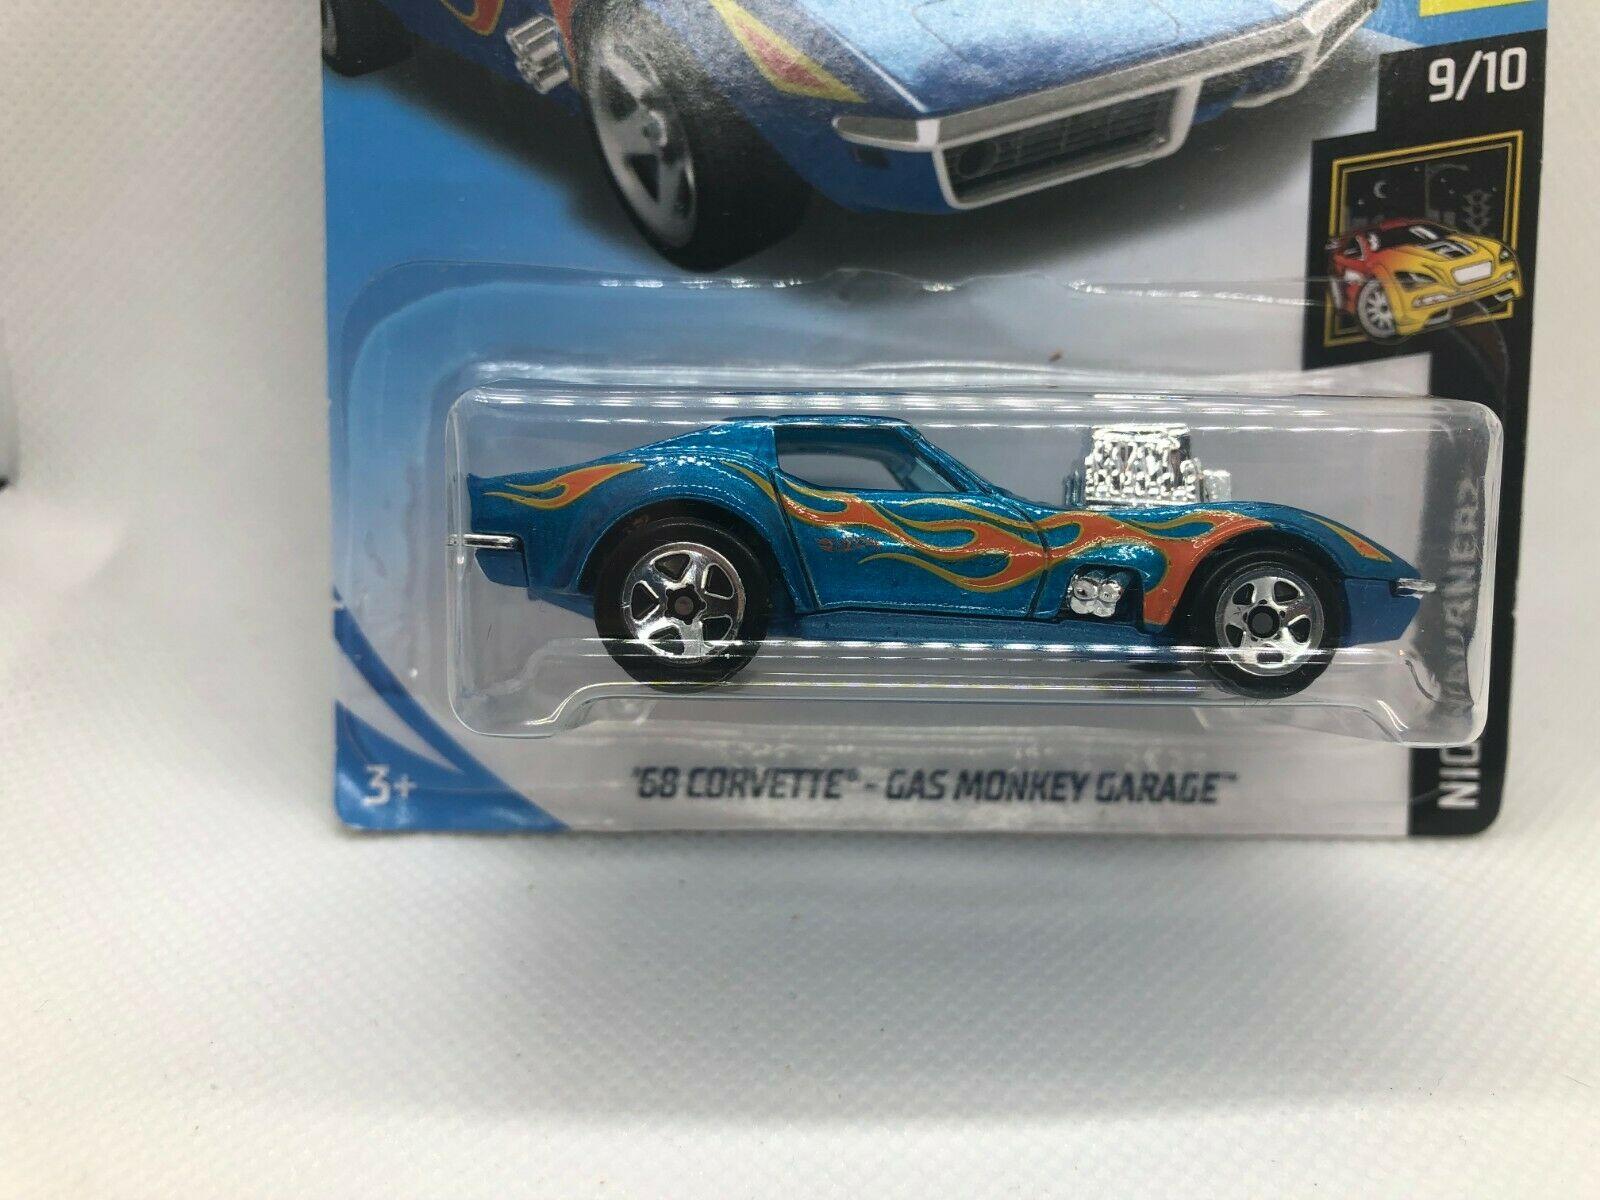 68 Corvette - Gas Monkey Garage